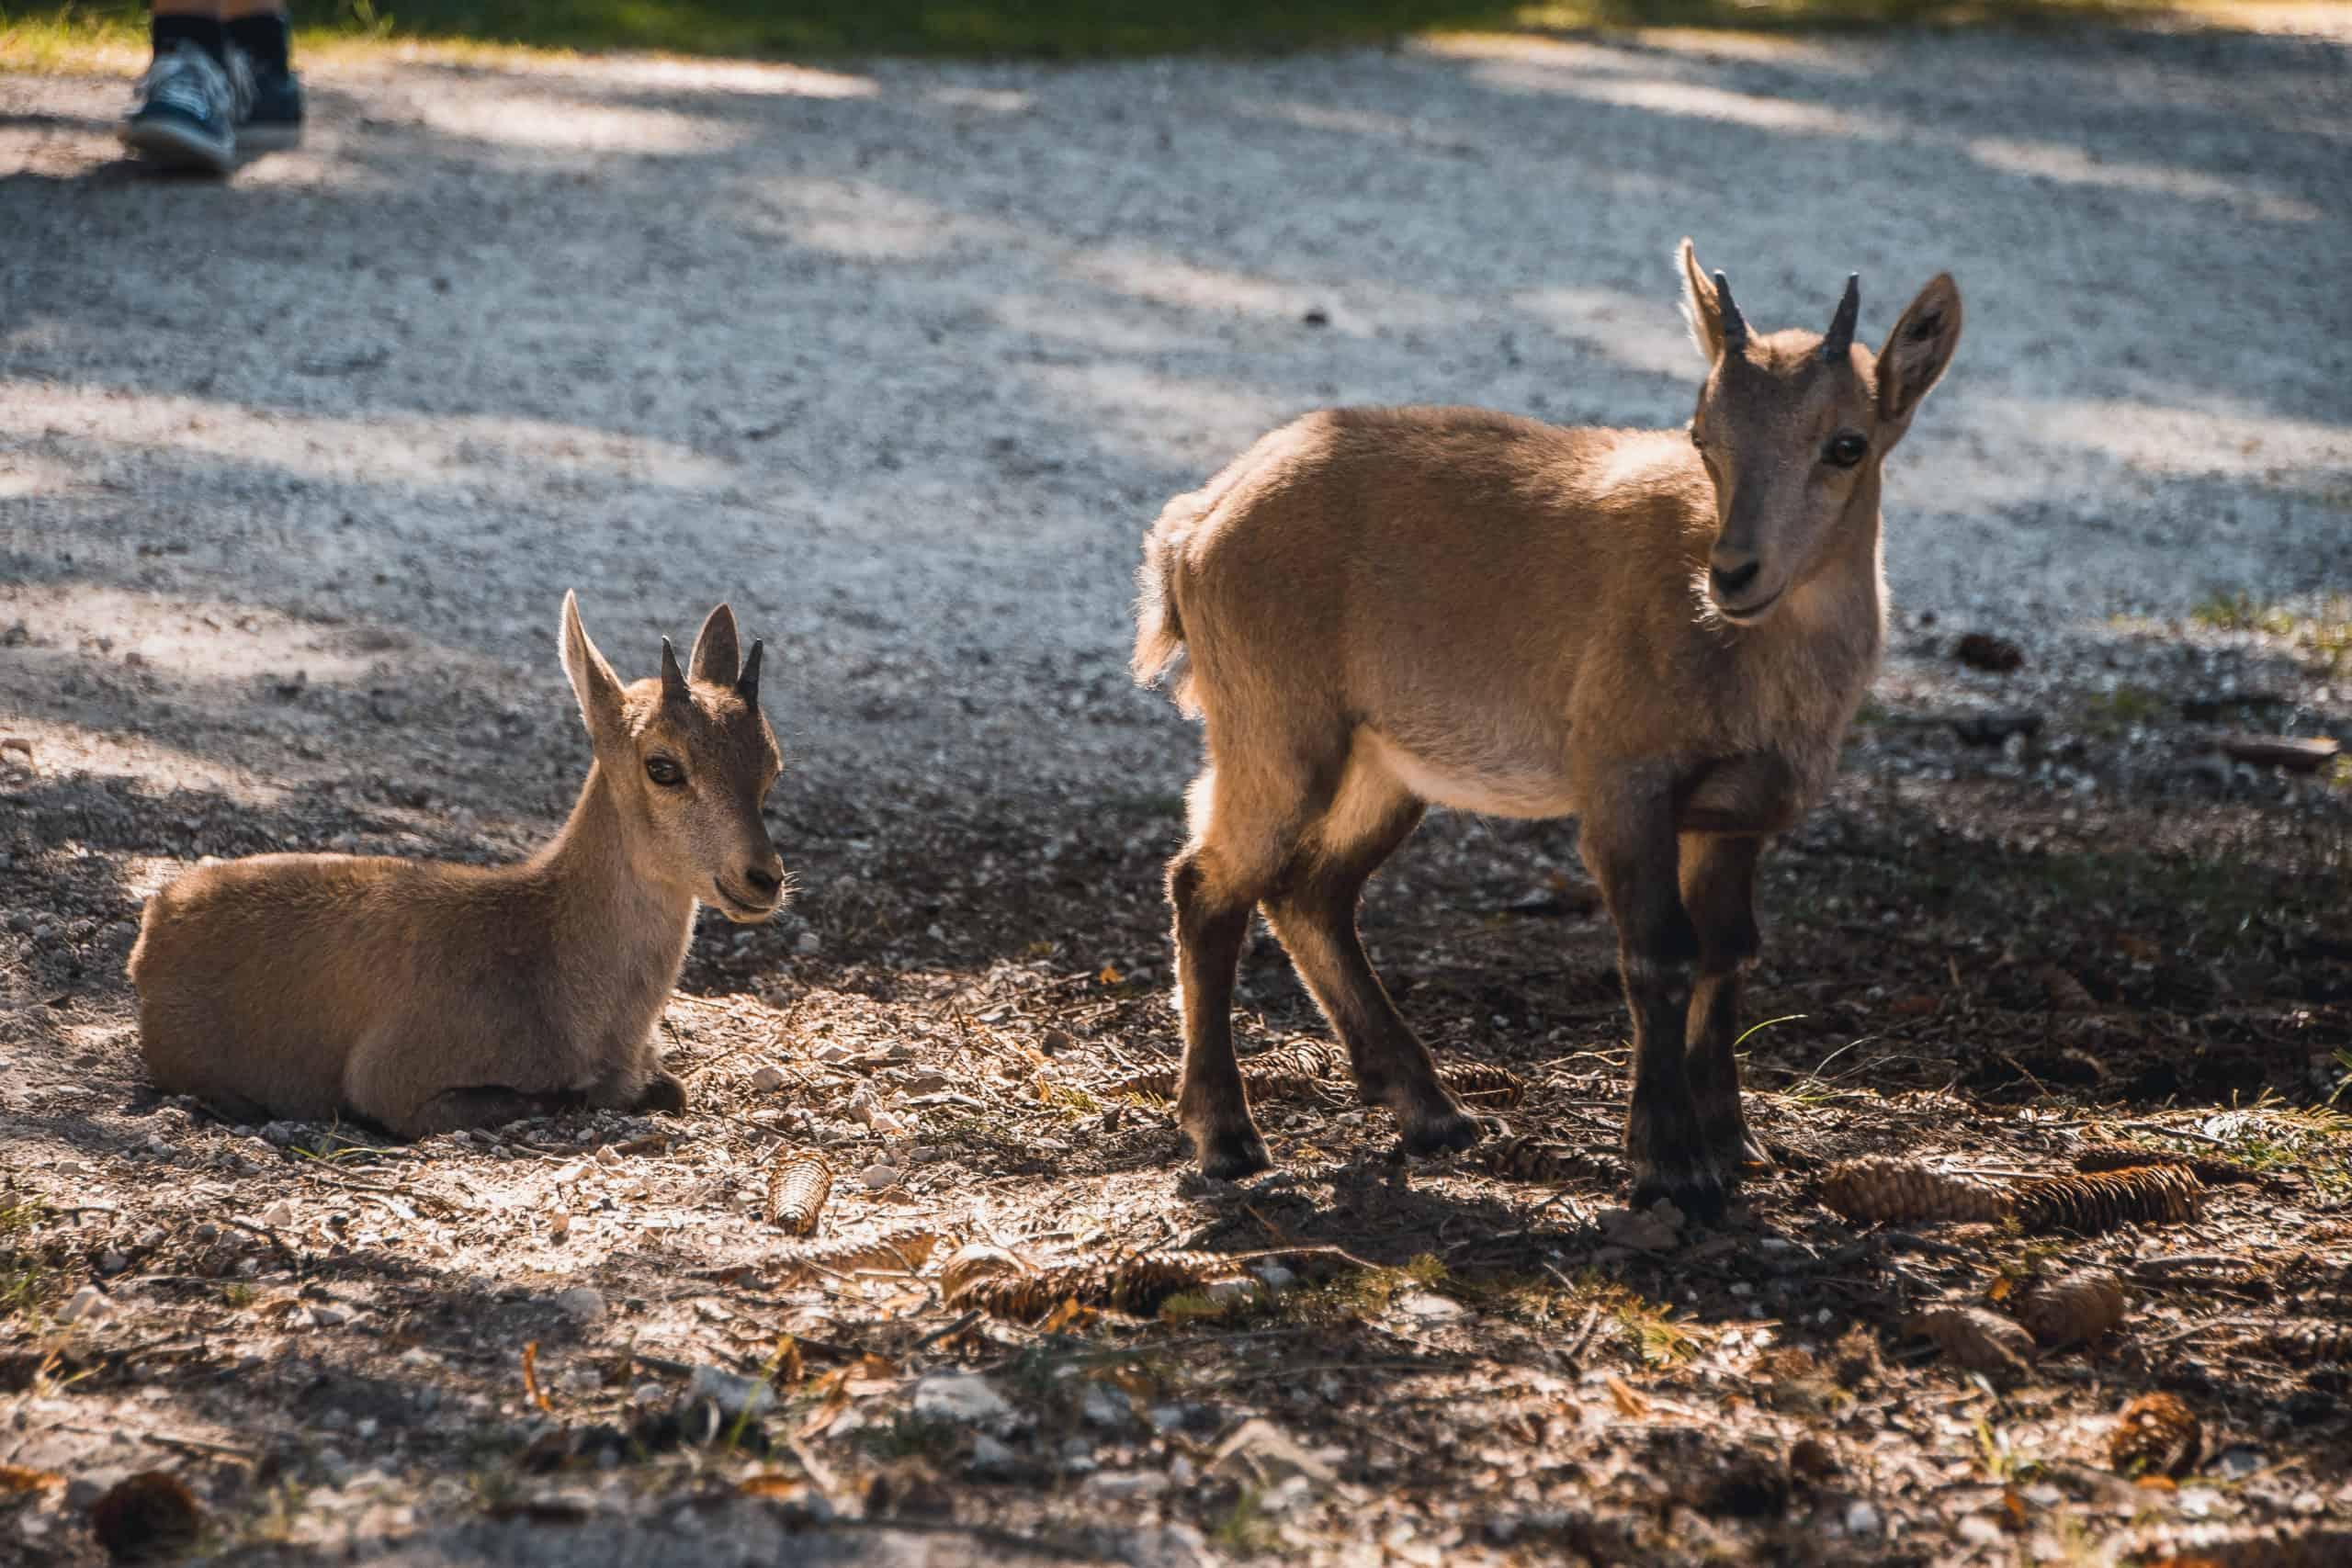 Tiere im Zoo Rosegg - Tierpark in Kärnten